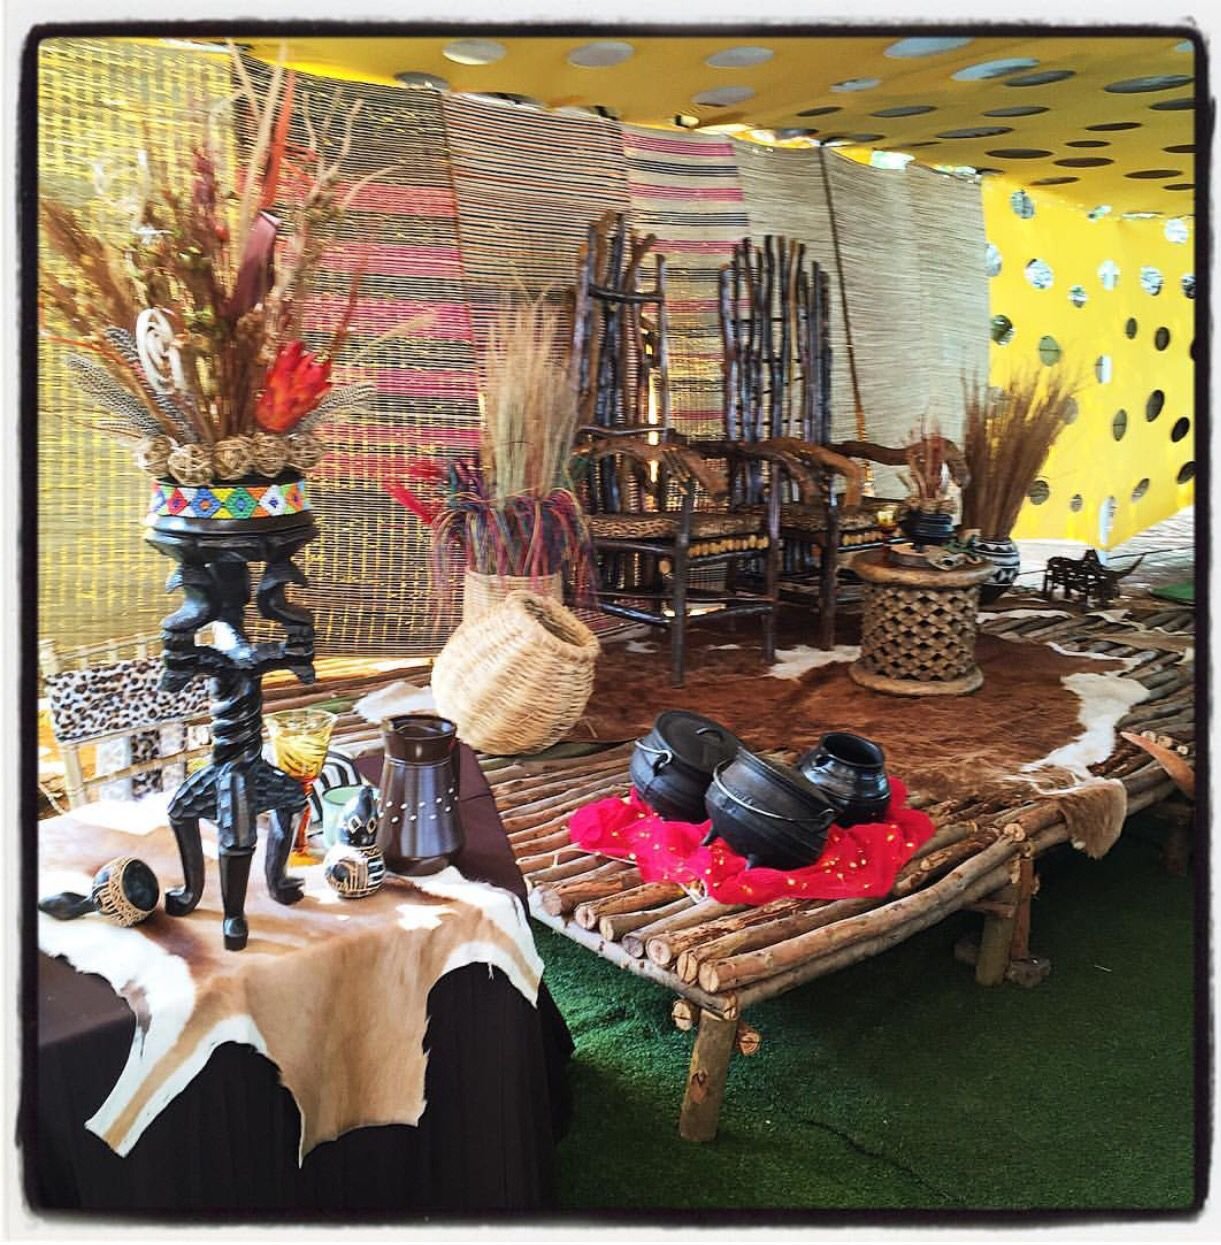 Yoruba traditional wedding decorations  Tosin NormanWilliams tosinnormanwill on Pinterest